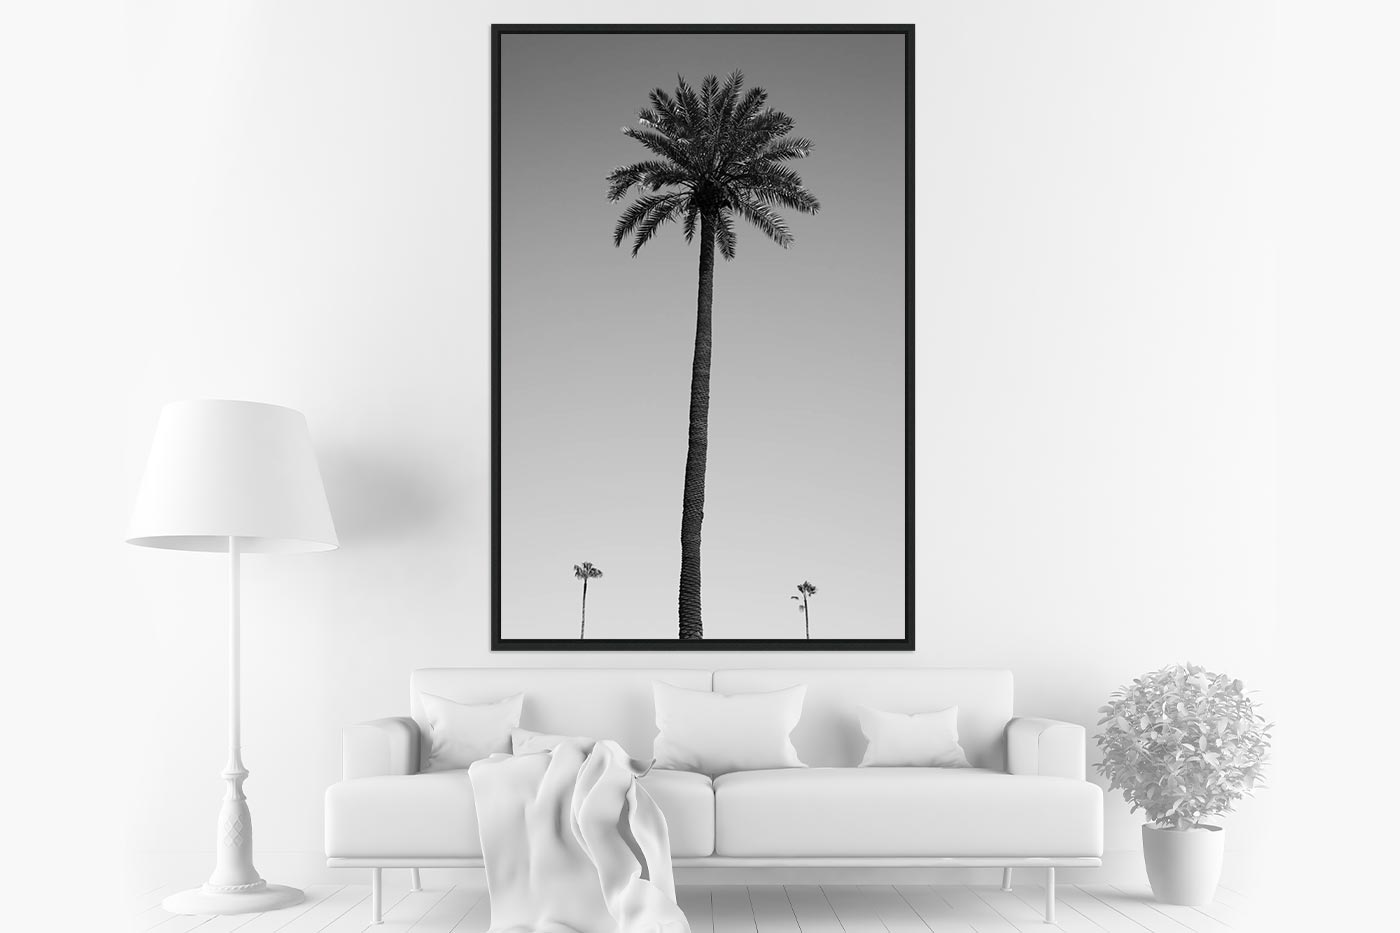 Caisse americaine 80x120 Three palm trees